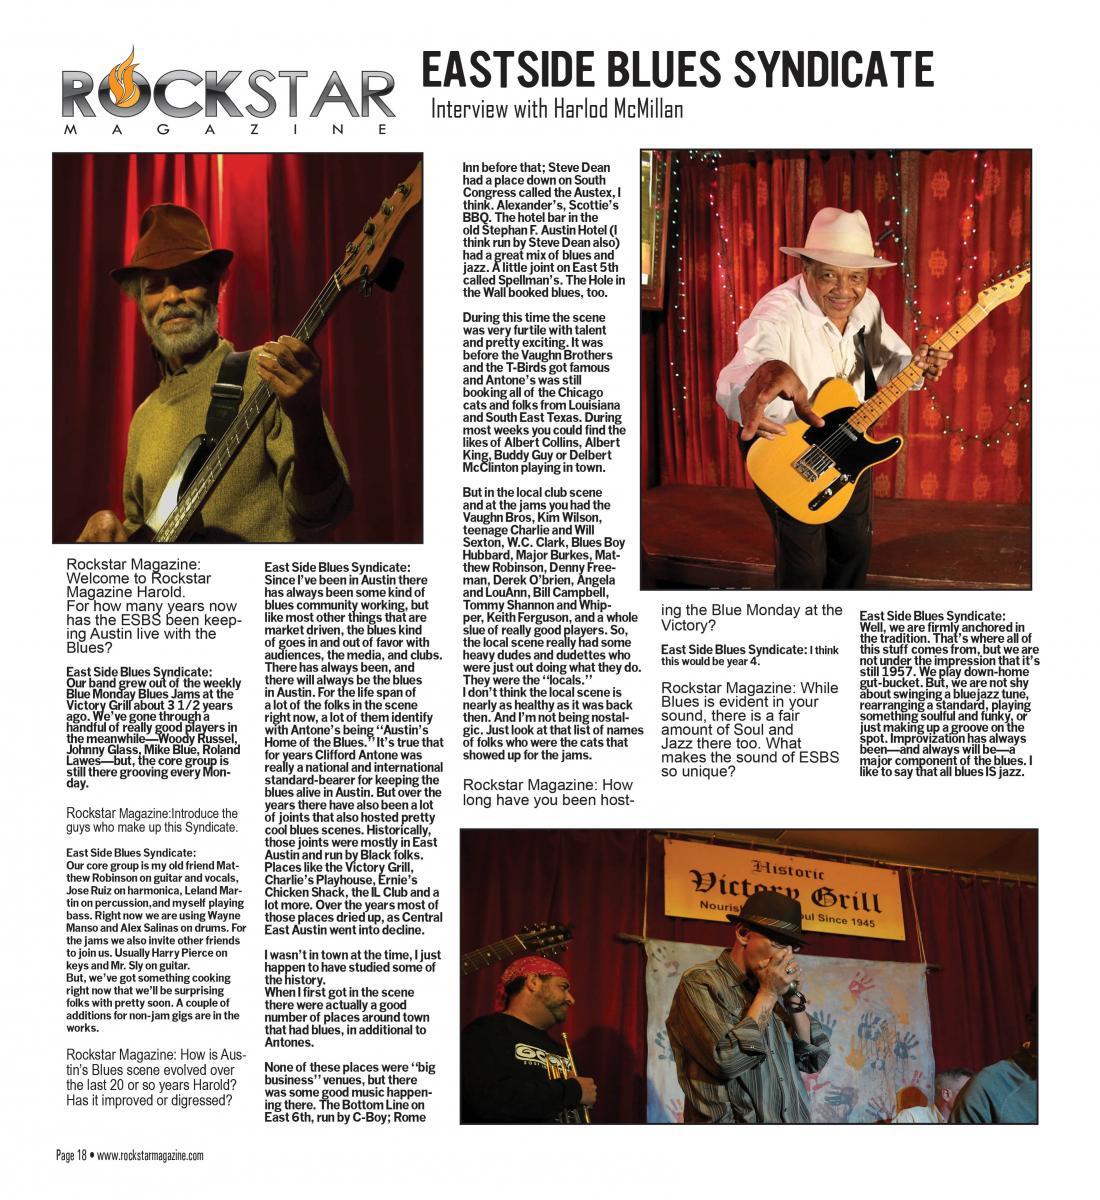 RockStar Magazine Feb. 2014